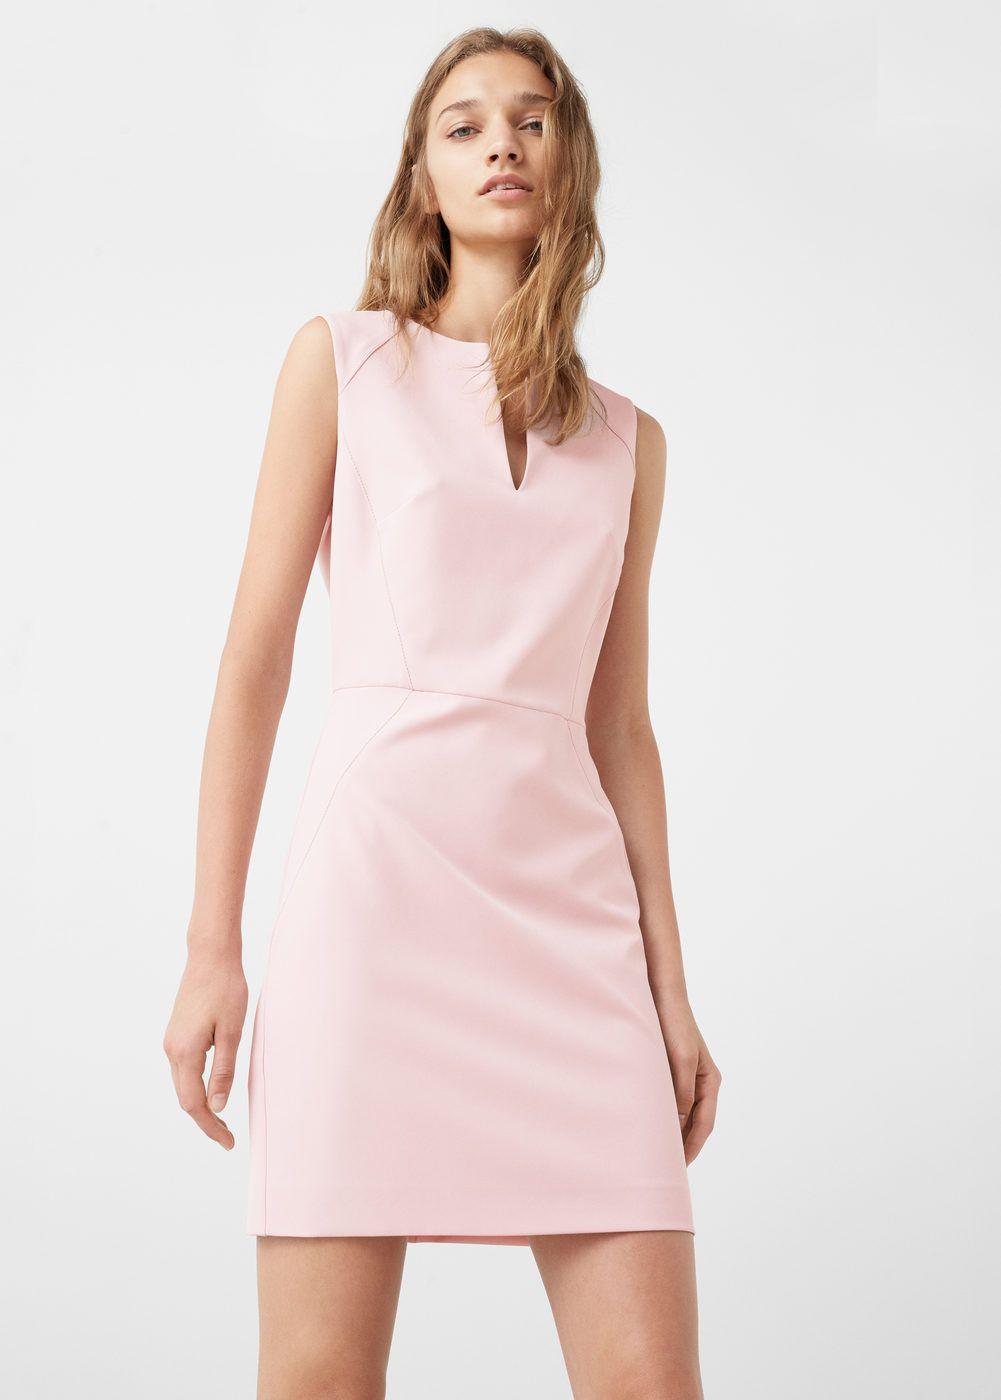 Shift dress - Woman   In Fashion   In Style   Dresses, Clothes ... e228c1e3db